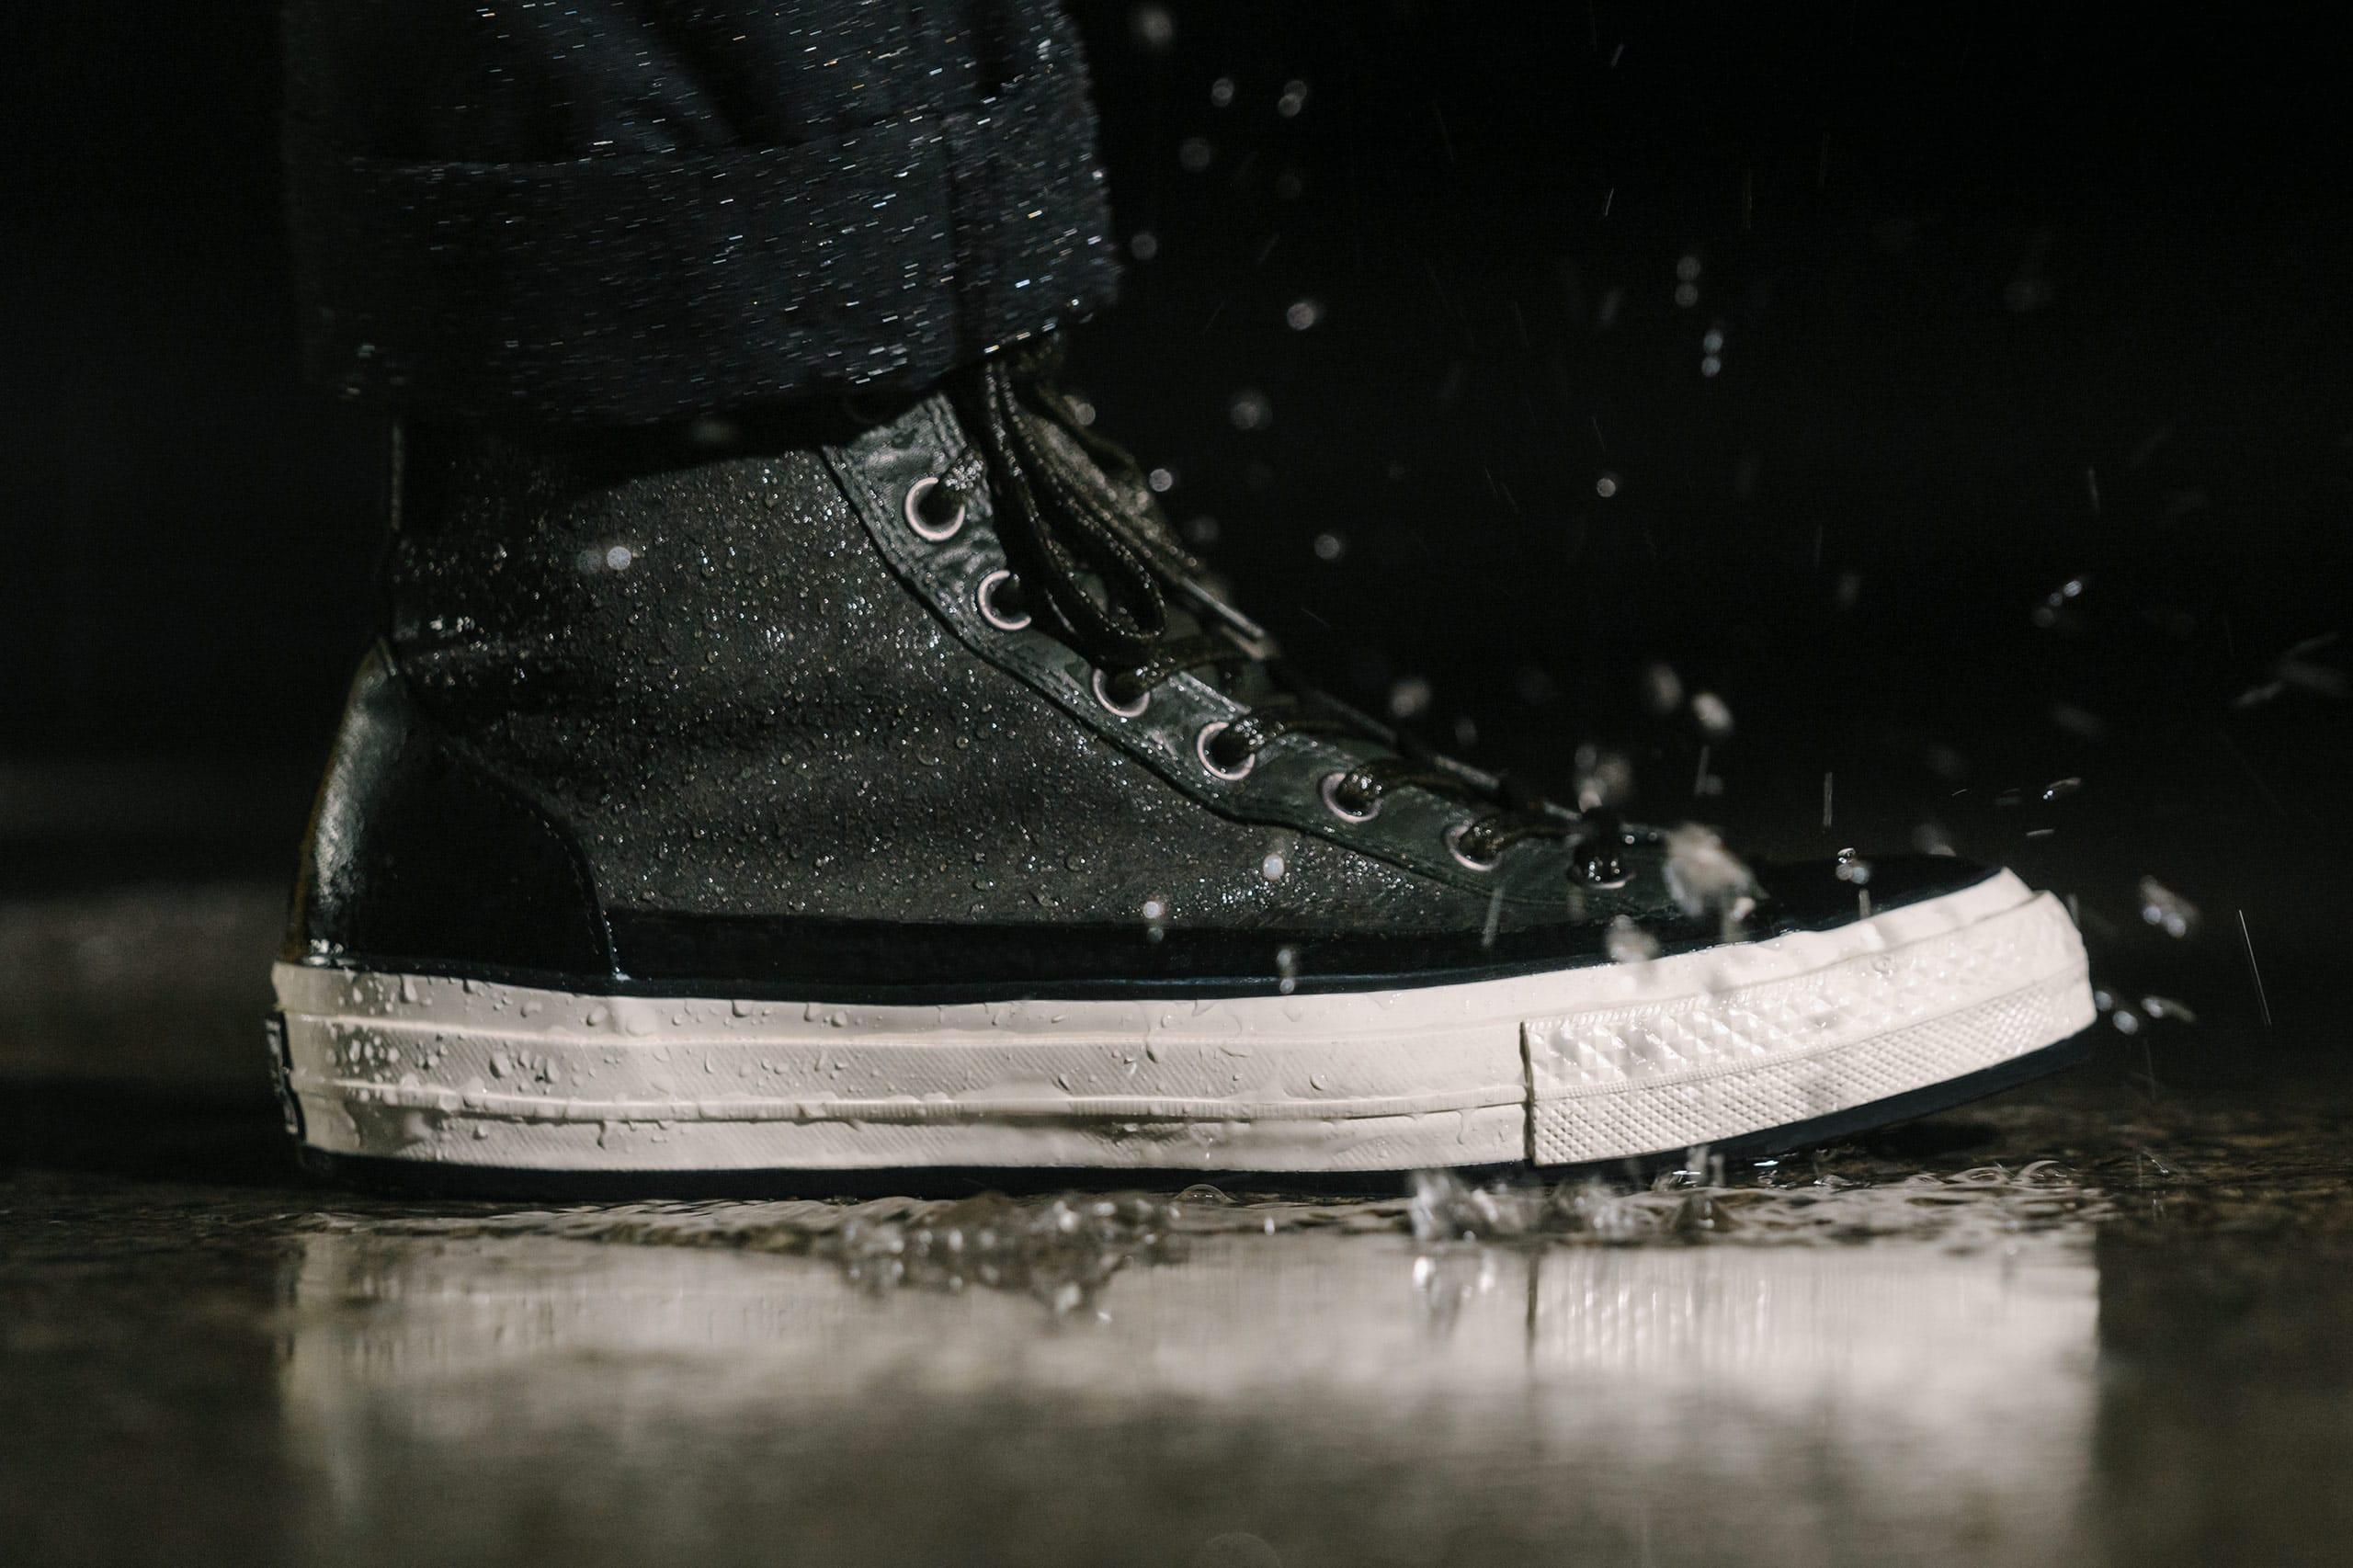 HAVEN x Converse Chuck 70 GORE-TEX